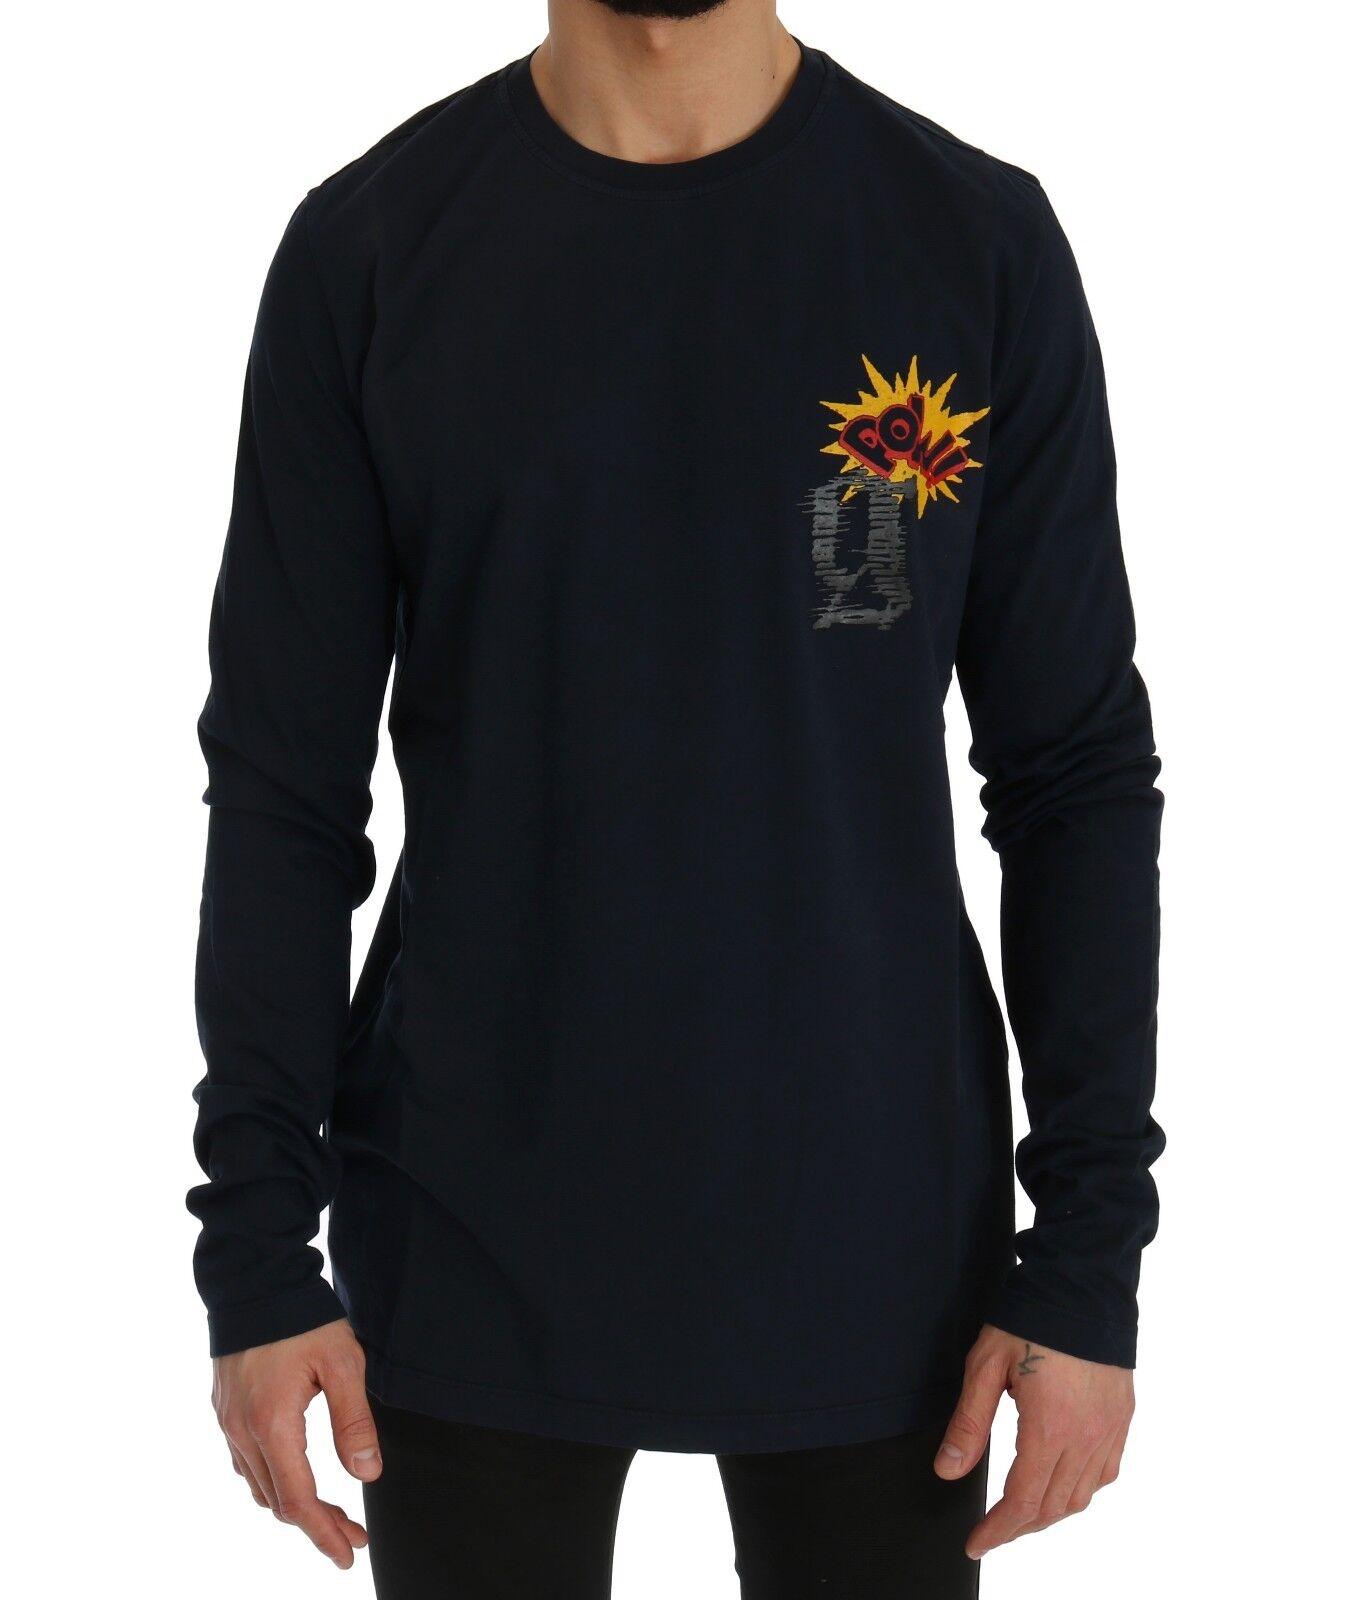 Nuovo Galliano T-Shirt Maglione Blu Motivo Pow Manica Lunga Girocollo S. XL